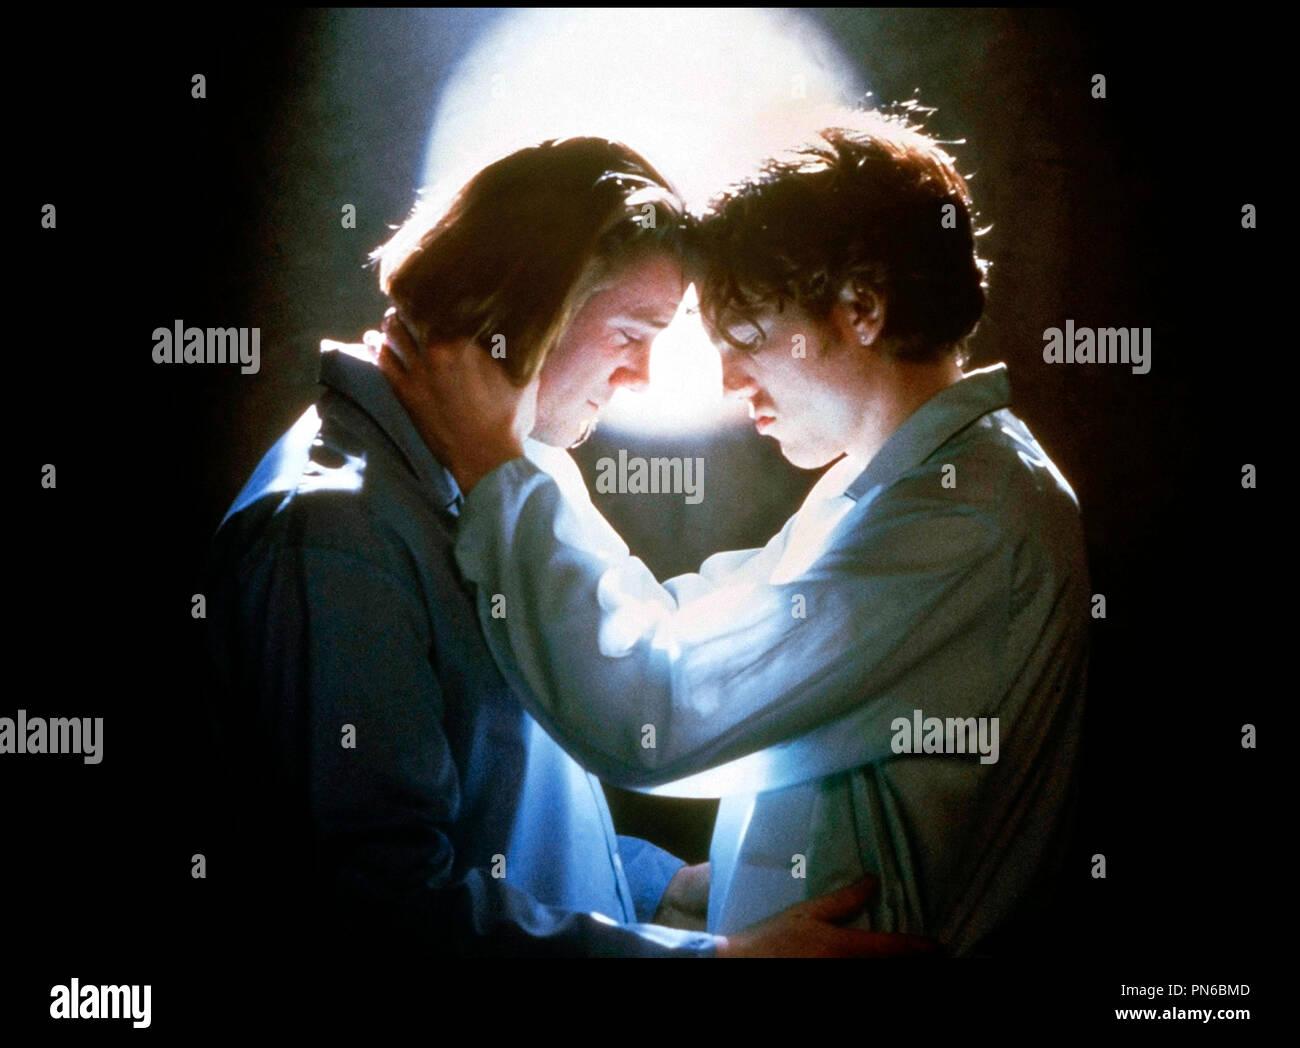 Prod DB © Working Title / DR EDWARD II (EDWARD II) de Derek Jarman 1991 GB avec Steve Waddington et Andrew Tiernan homosexualite masculine, passion d'apres la piece de Christopher Marlowe - Stock Image